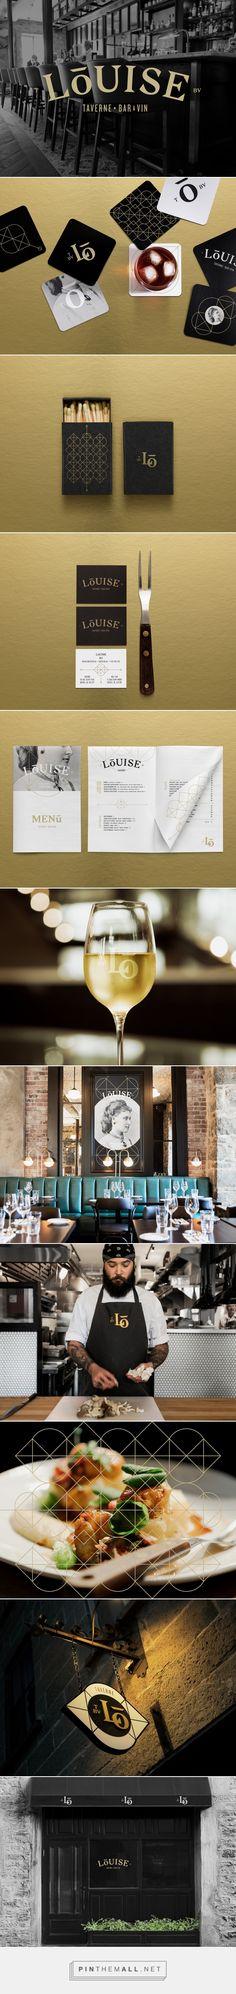 Taverne Louise Restaurant Branding by lg2 | Fivestar Branding Agency – Design and Branding Agency & Curated Inspiration Gallery #restaurantdesign #restaurantbranding #branding #brand #brandidentity #design #designinspiration